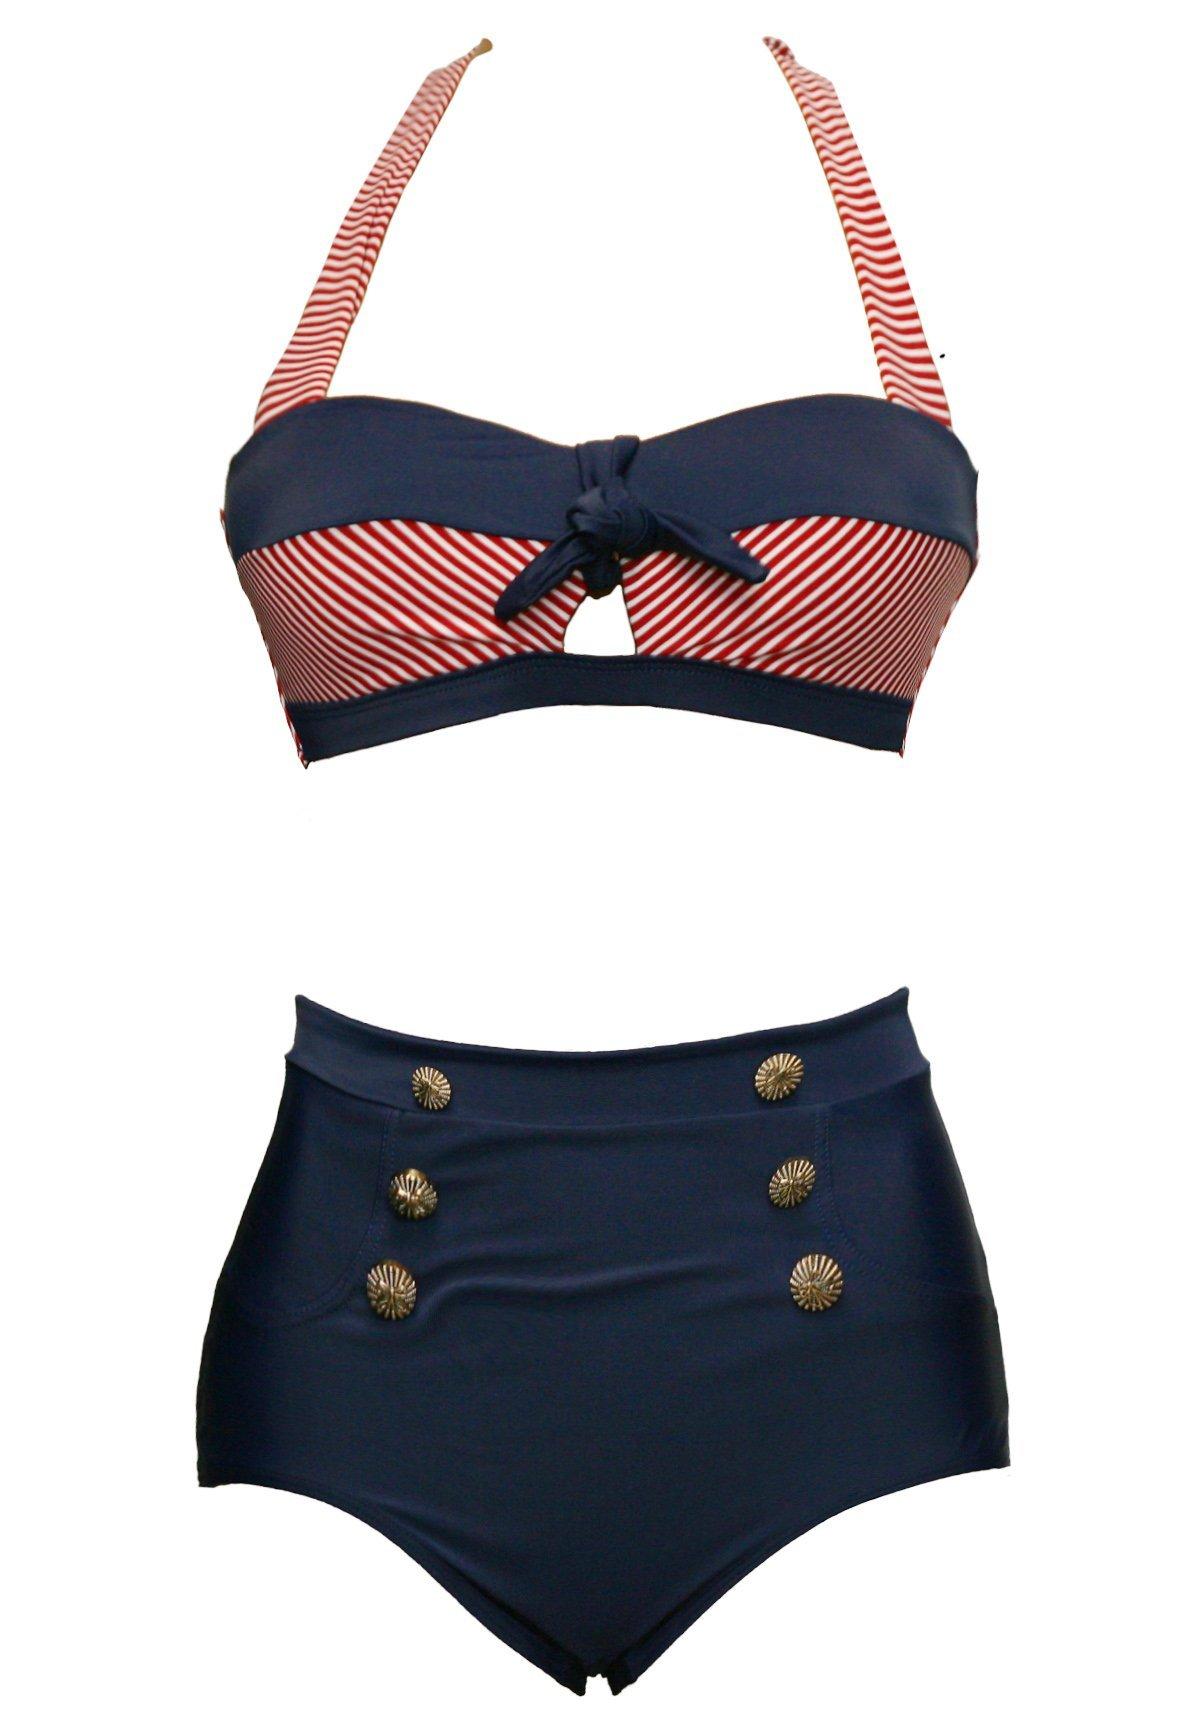 Bslingerie Ladies Retro Vintage Push up High Waisted Bikini Swimsuit Plus Size (M, Red Striped Keyhole)